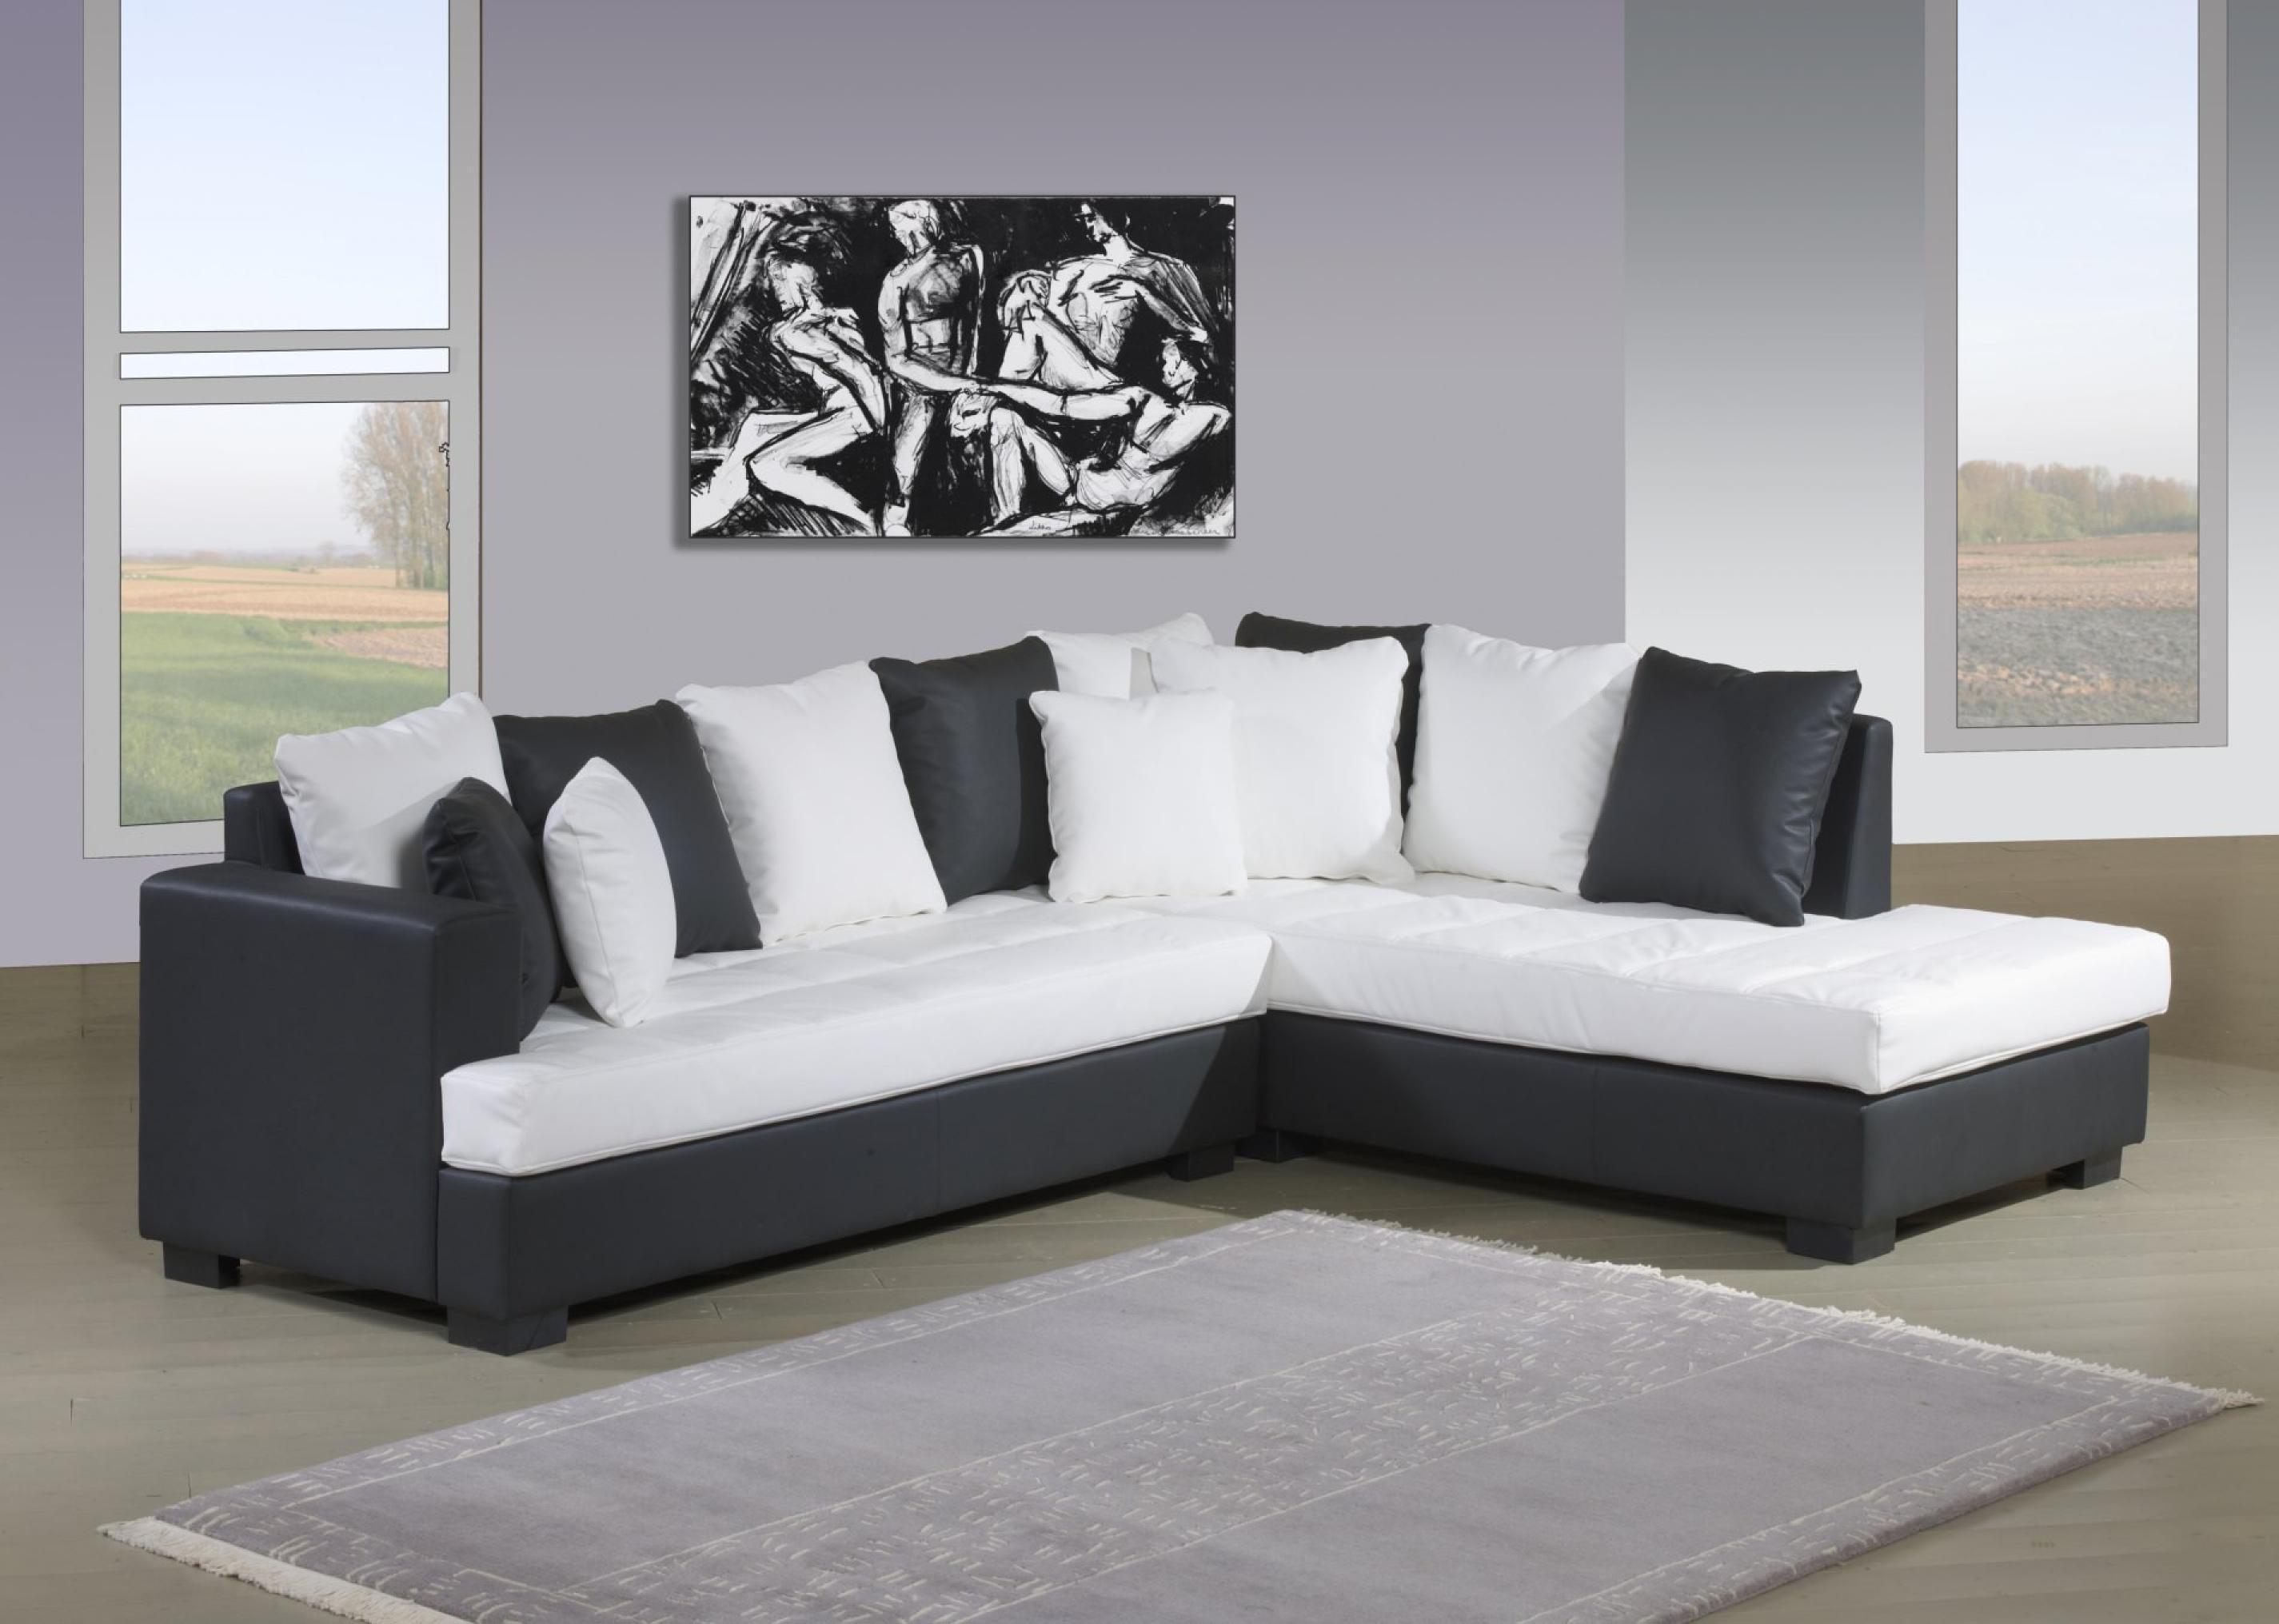 Ikea Canapé D Angle Convertible Beau Images Canaps D Angle Ikea Canap Duangle Convertible aspen Coloris